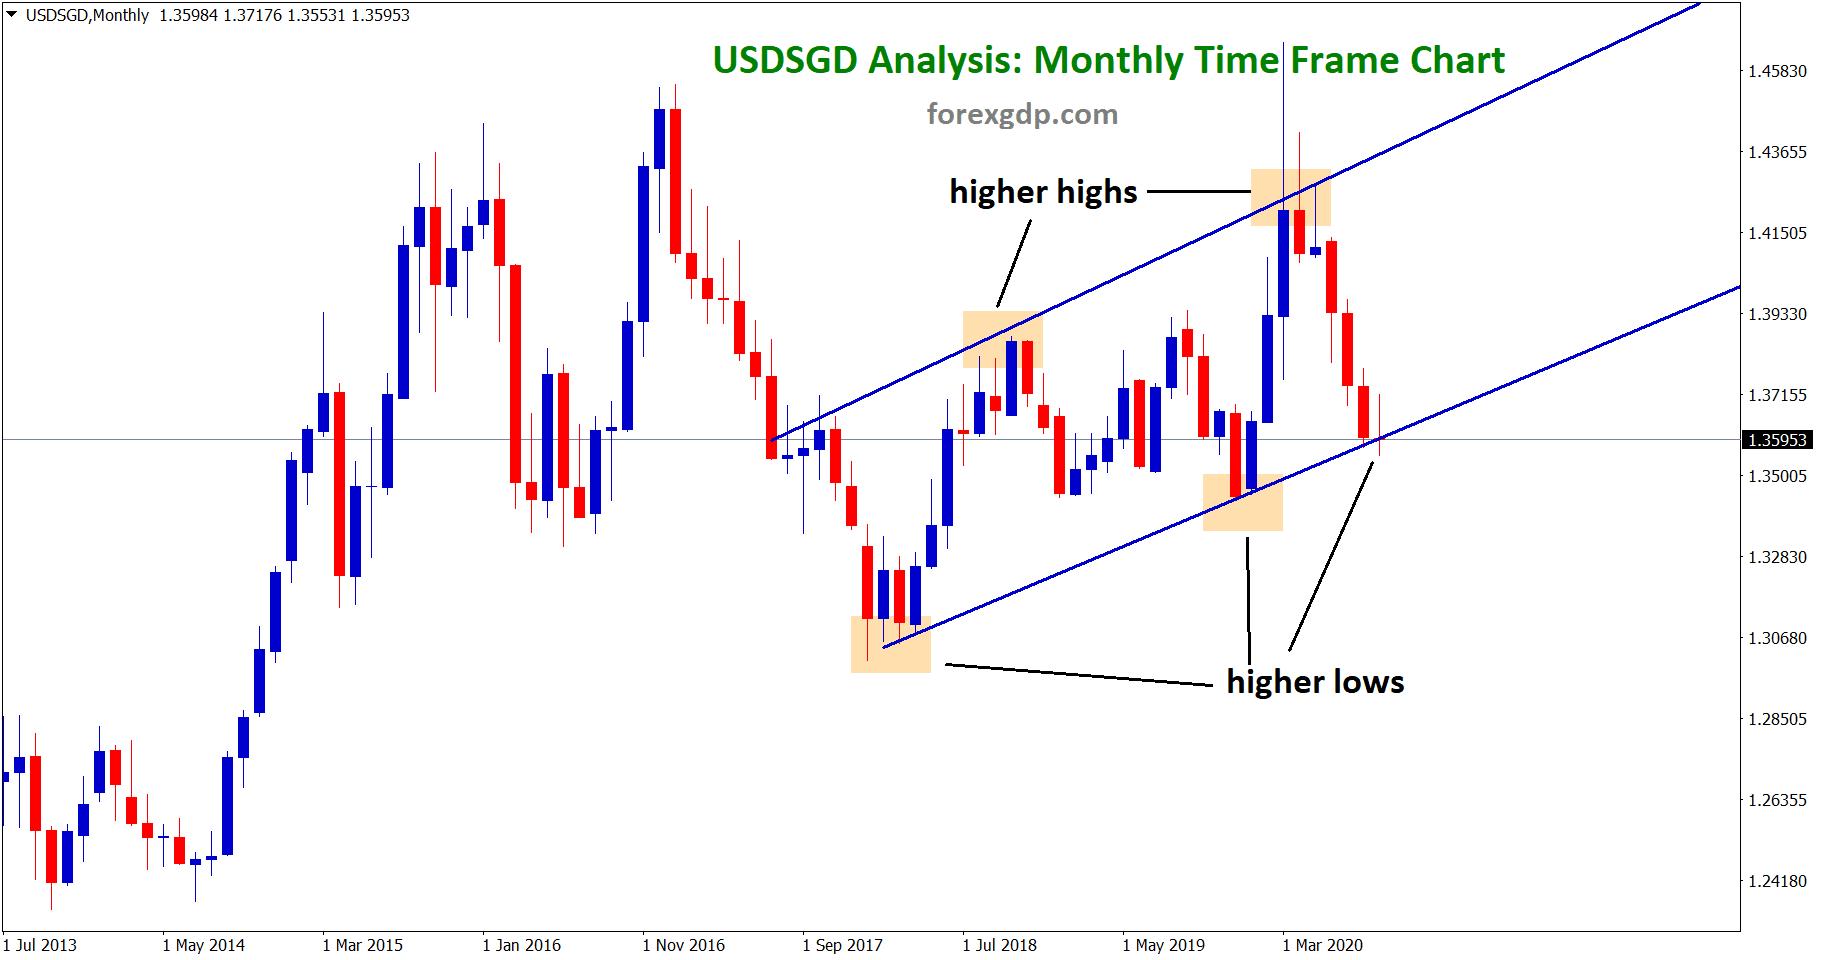 USDSGD trend analysis on monthly chart